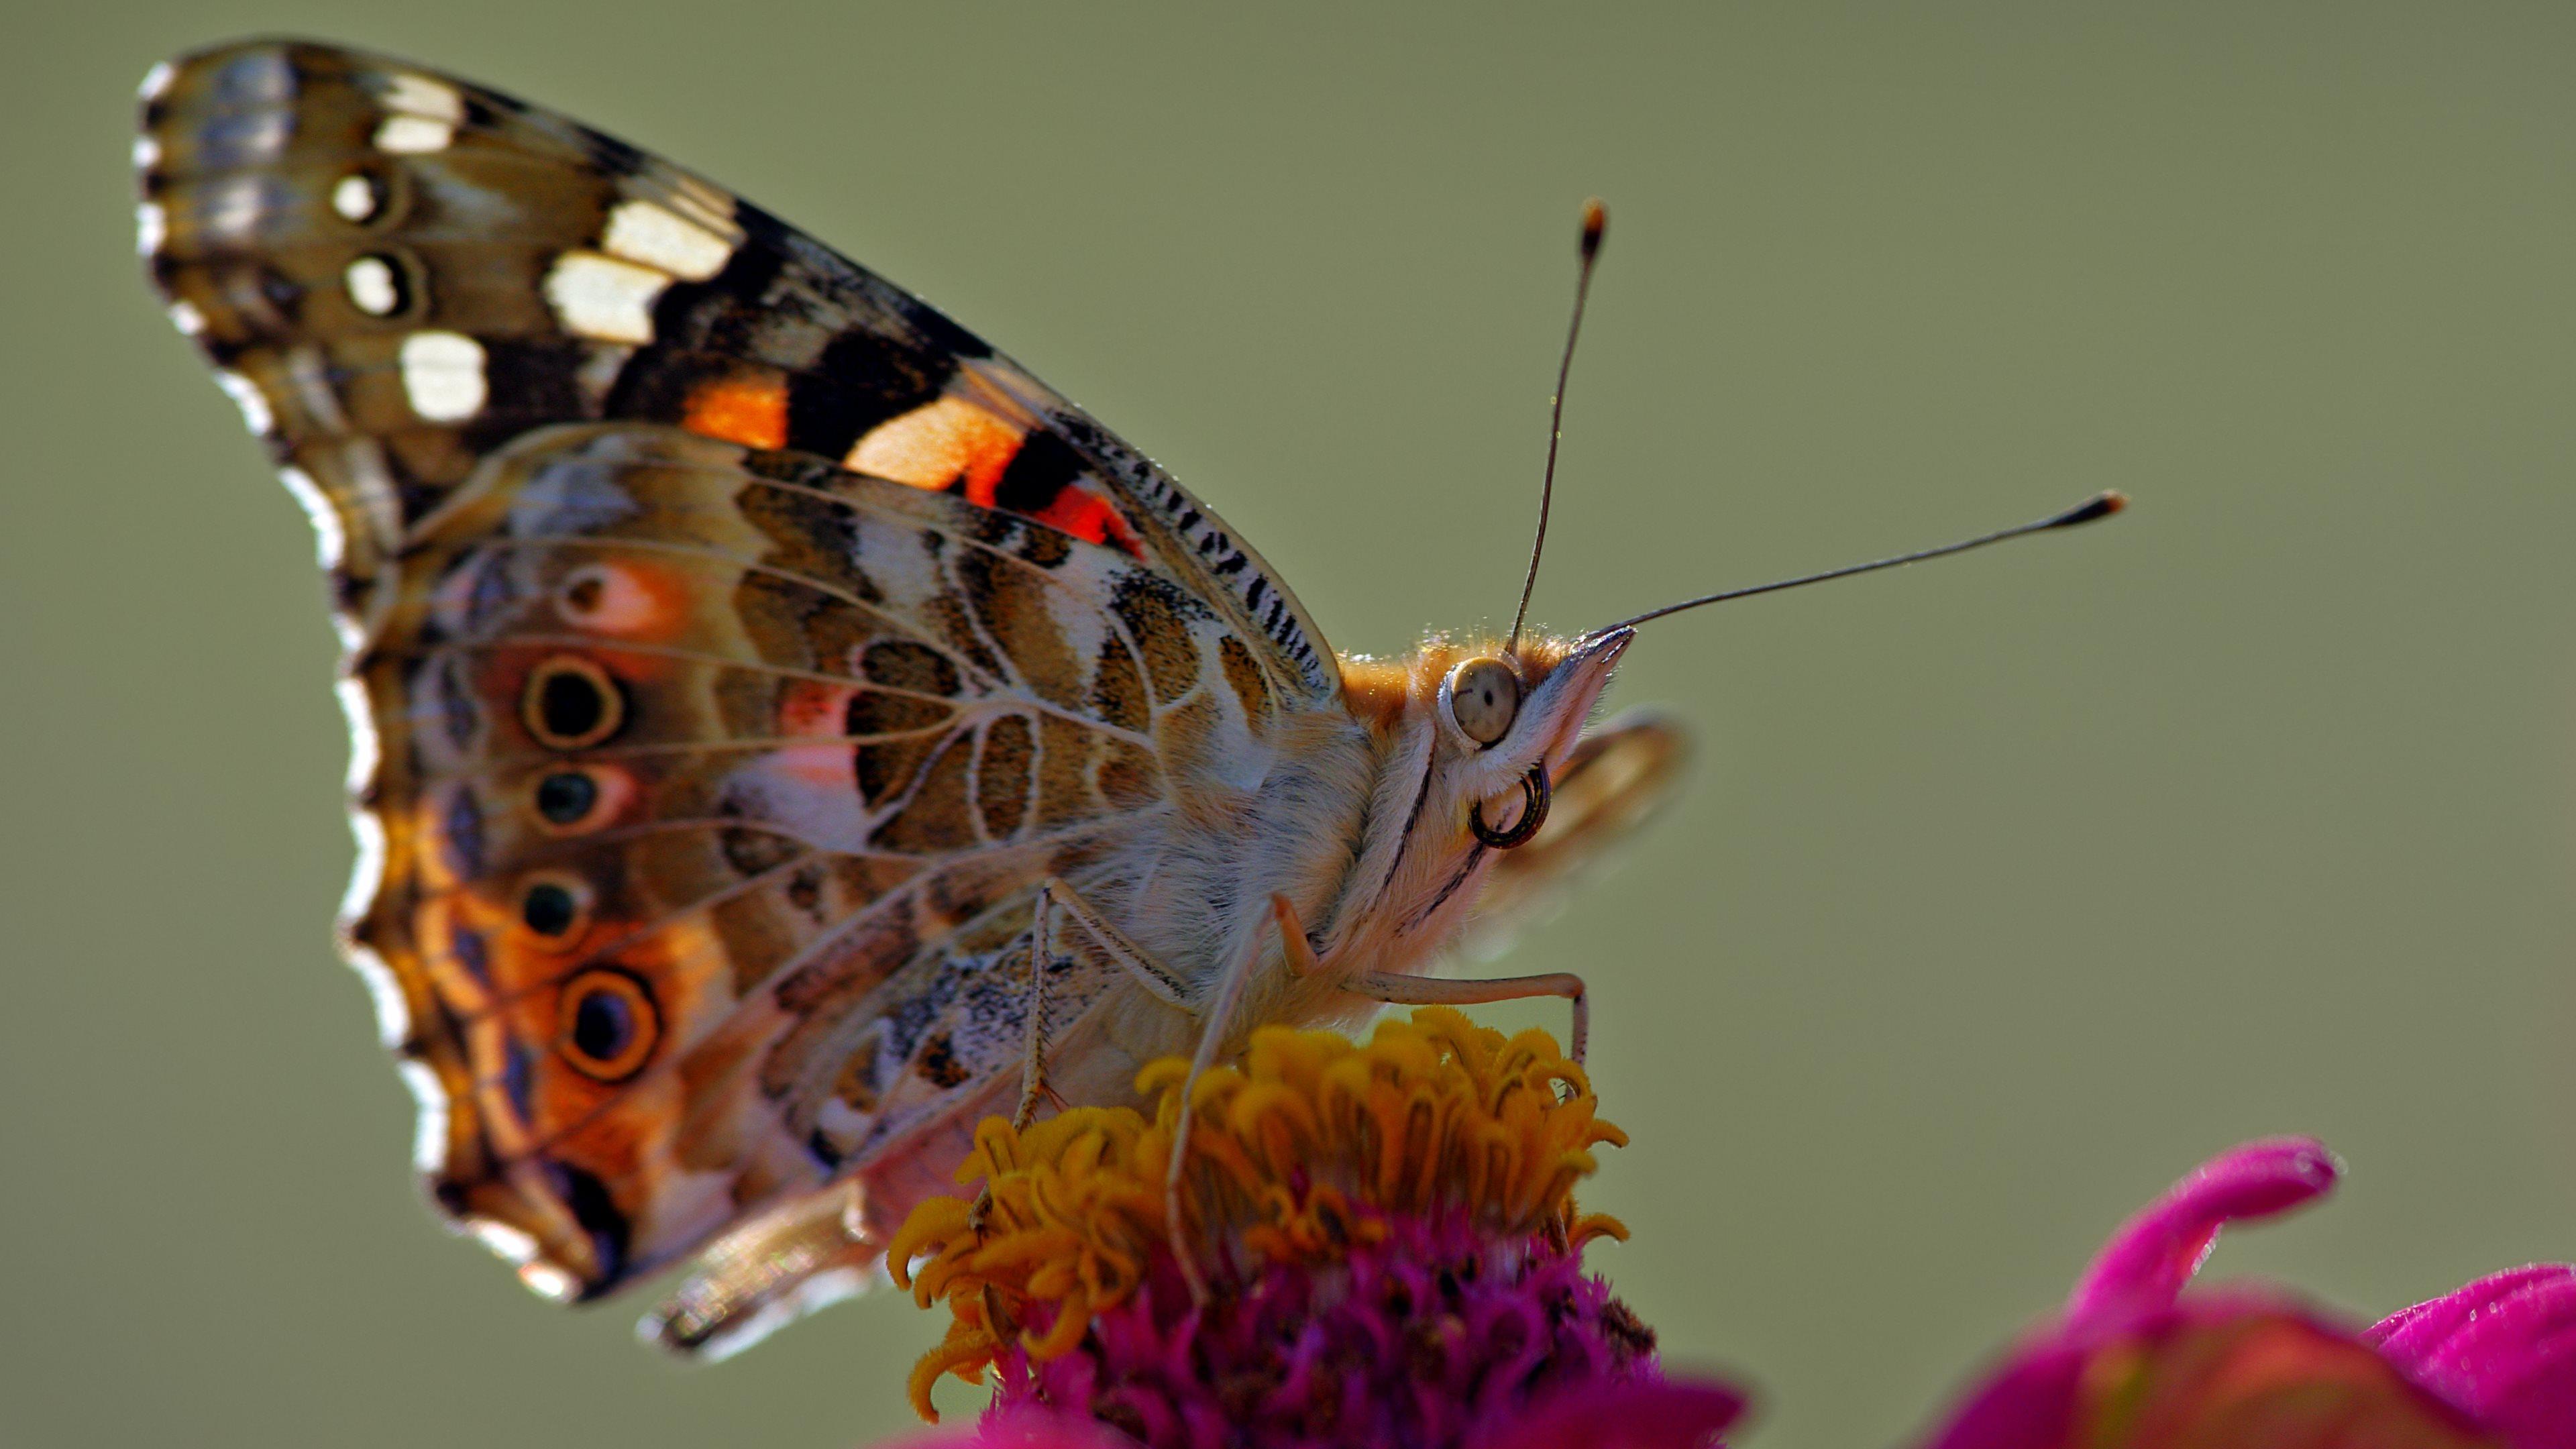 Butterfly Macro 4k Ultra HD Sfondo and Sfondo | 3840x2160 ...